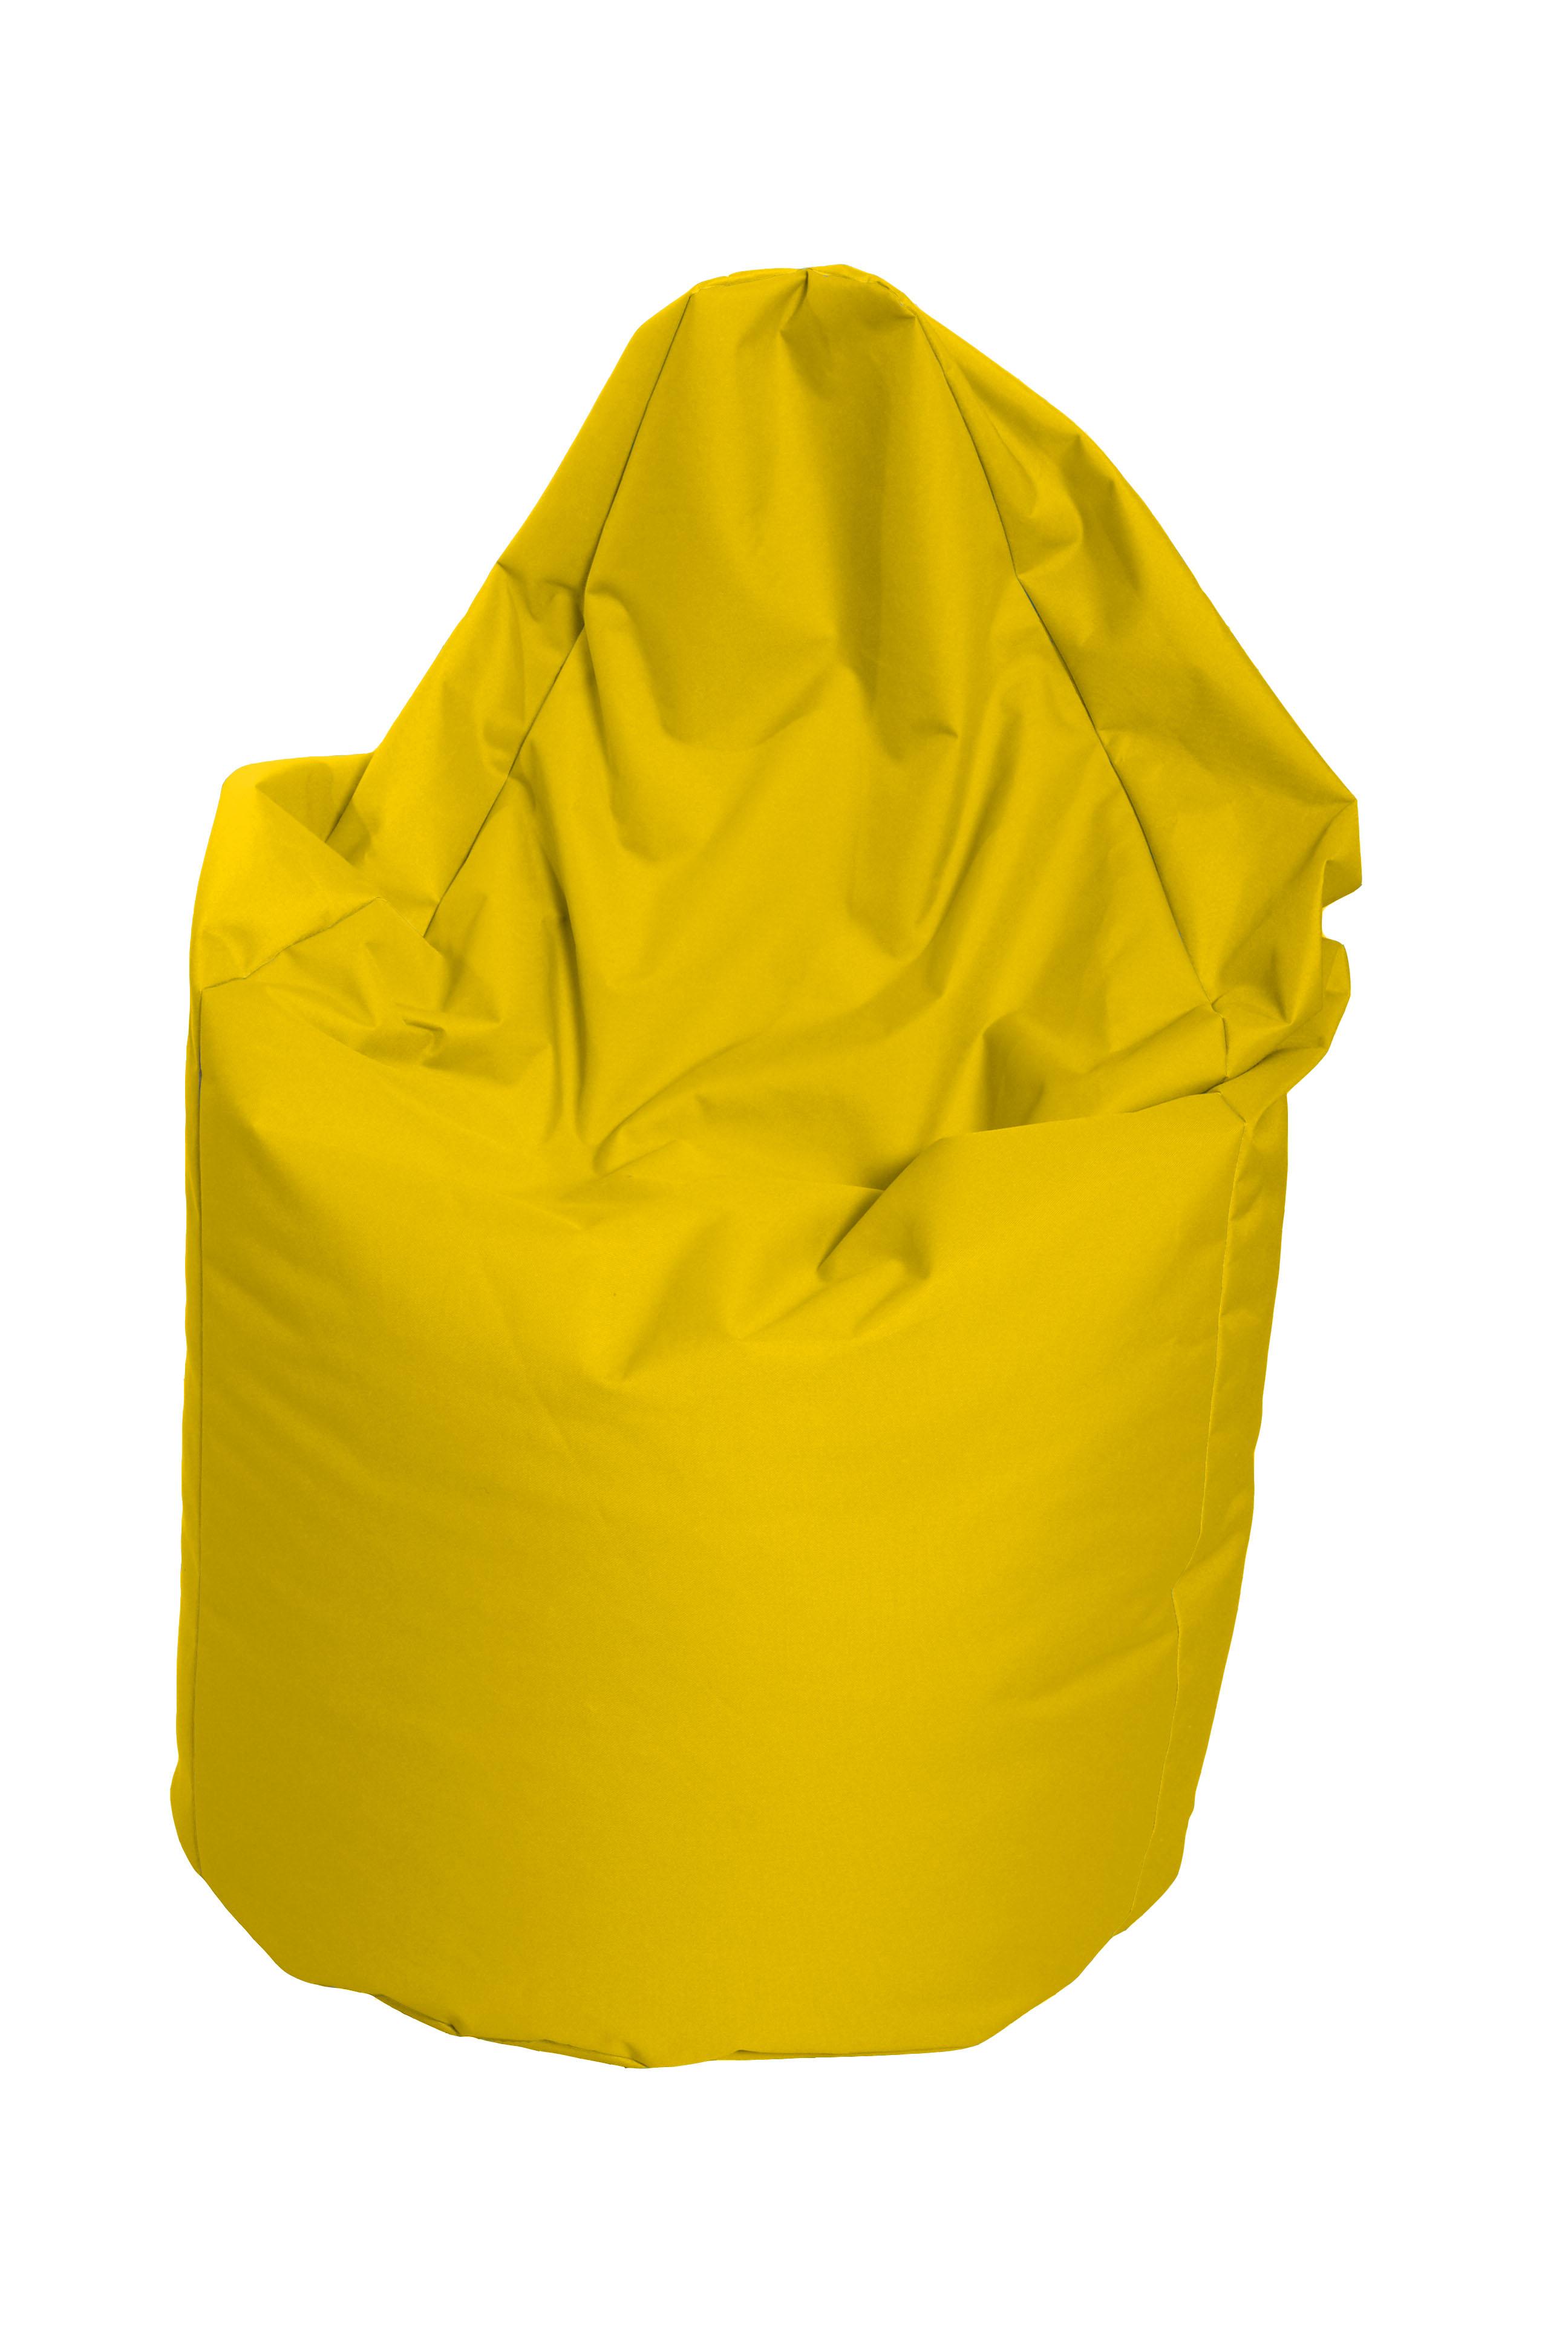 Sedací vak hruška Mega žlutá (žlutá 60103)